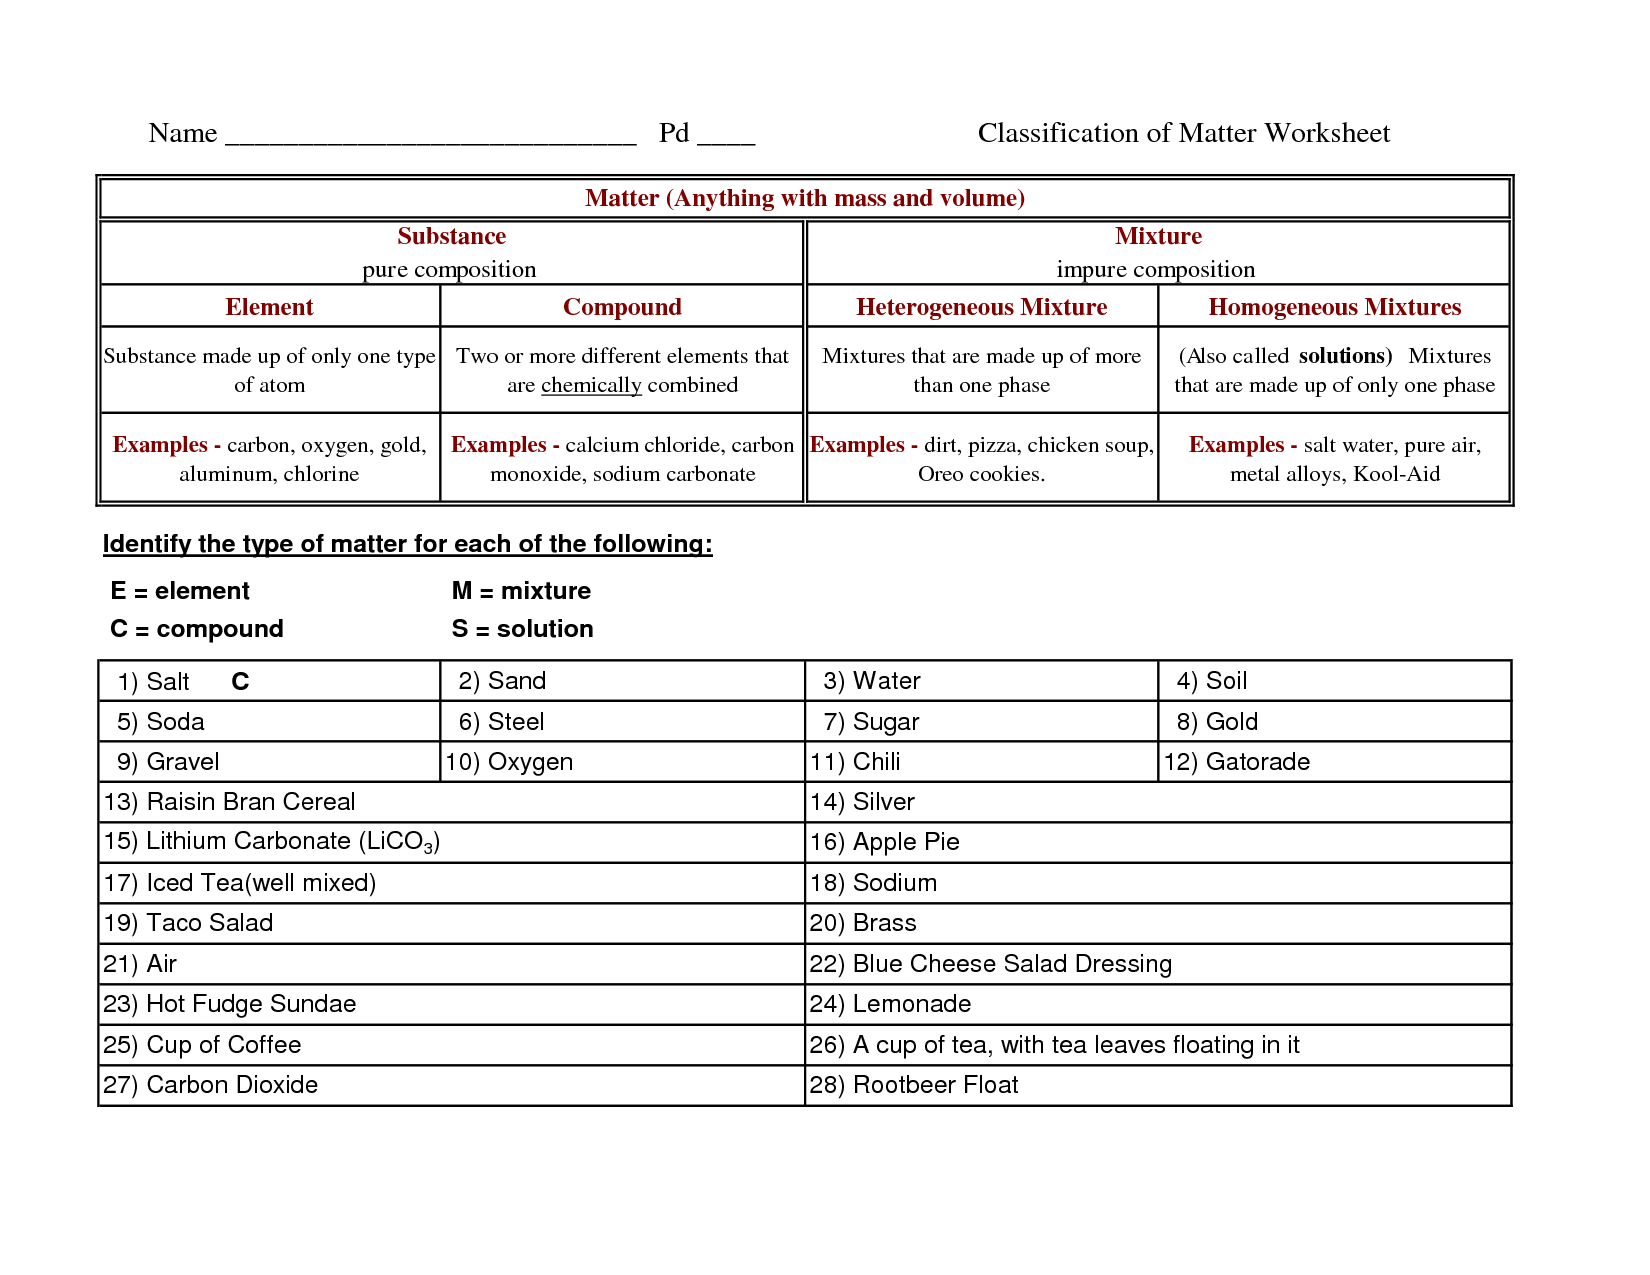 Composition Of Matter Worksheet Answers - worksheet